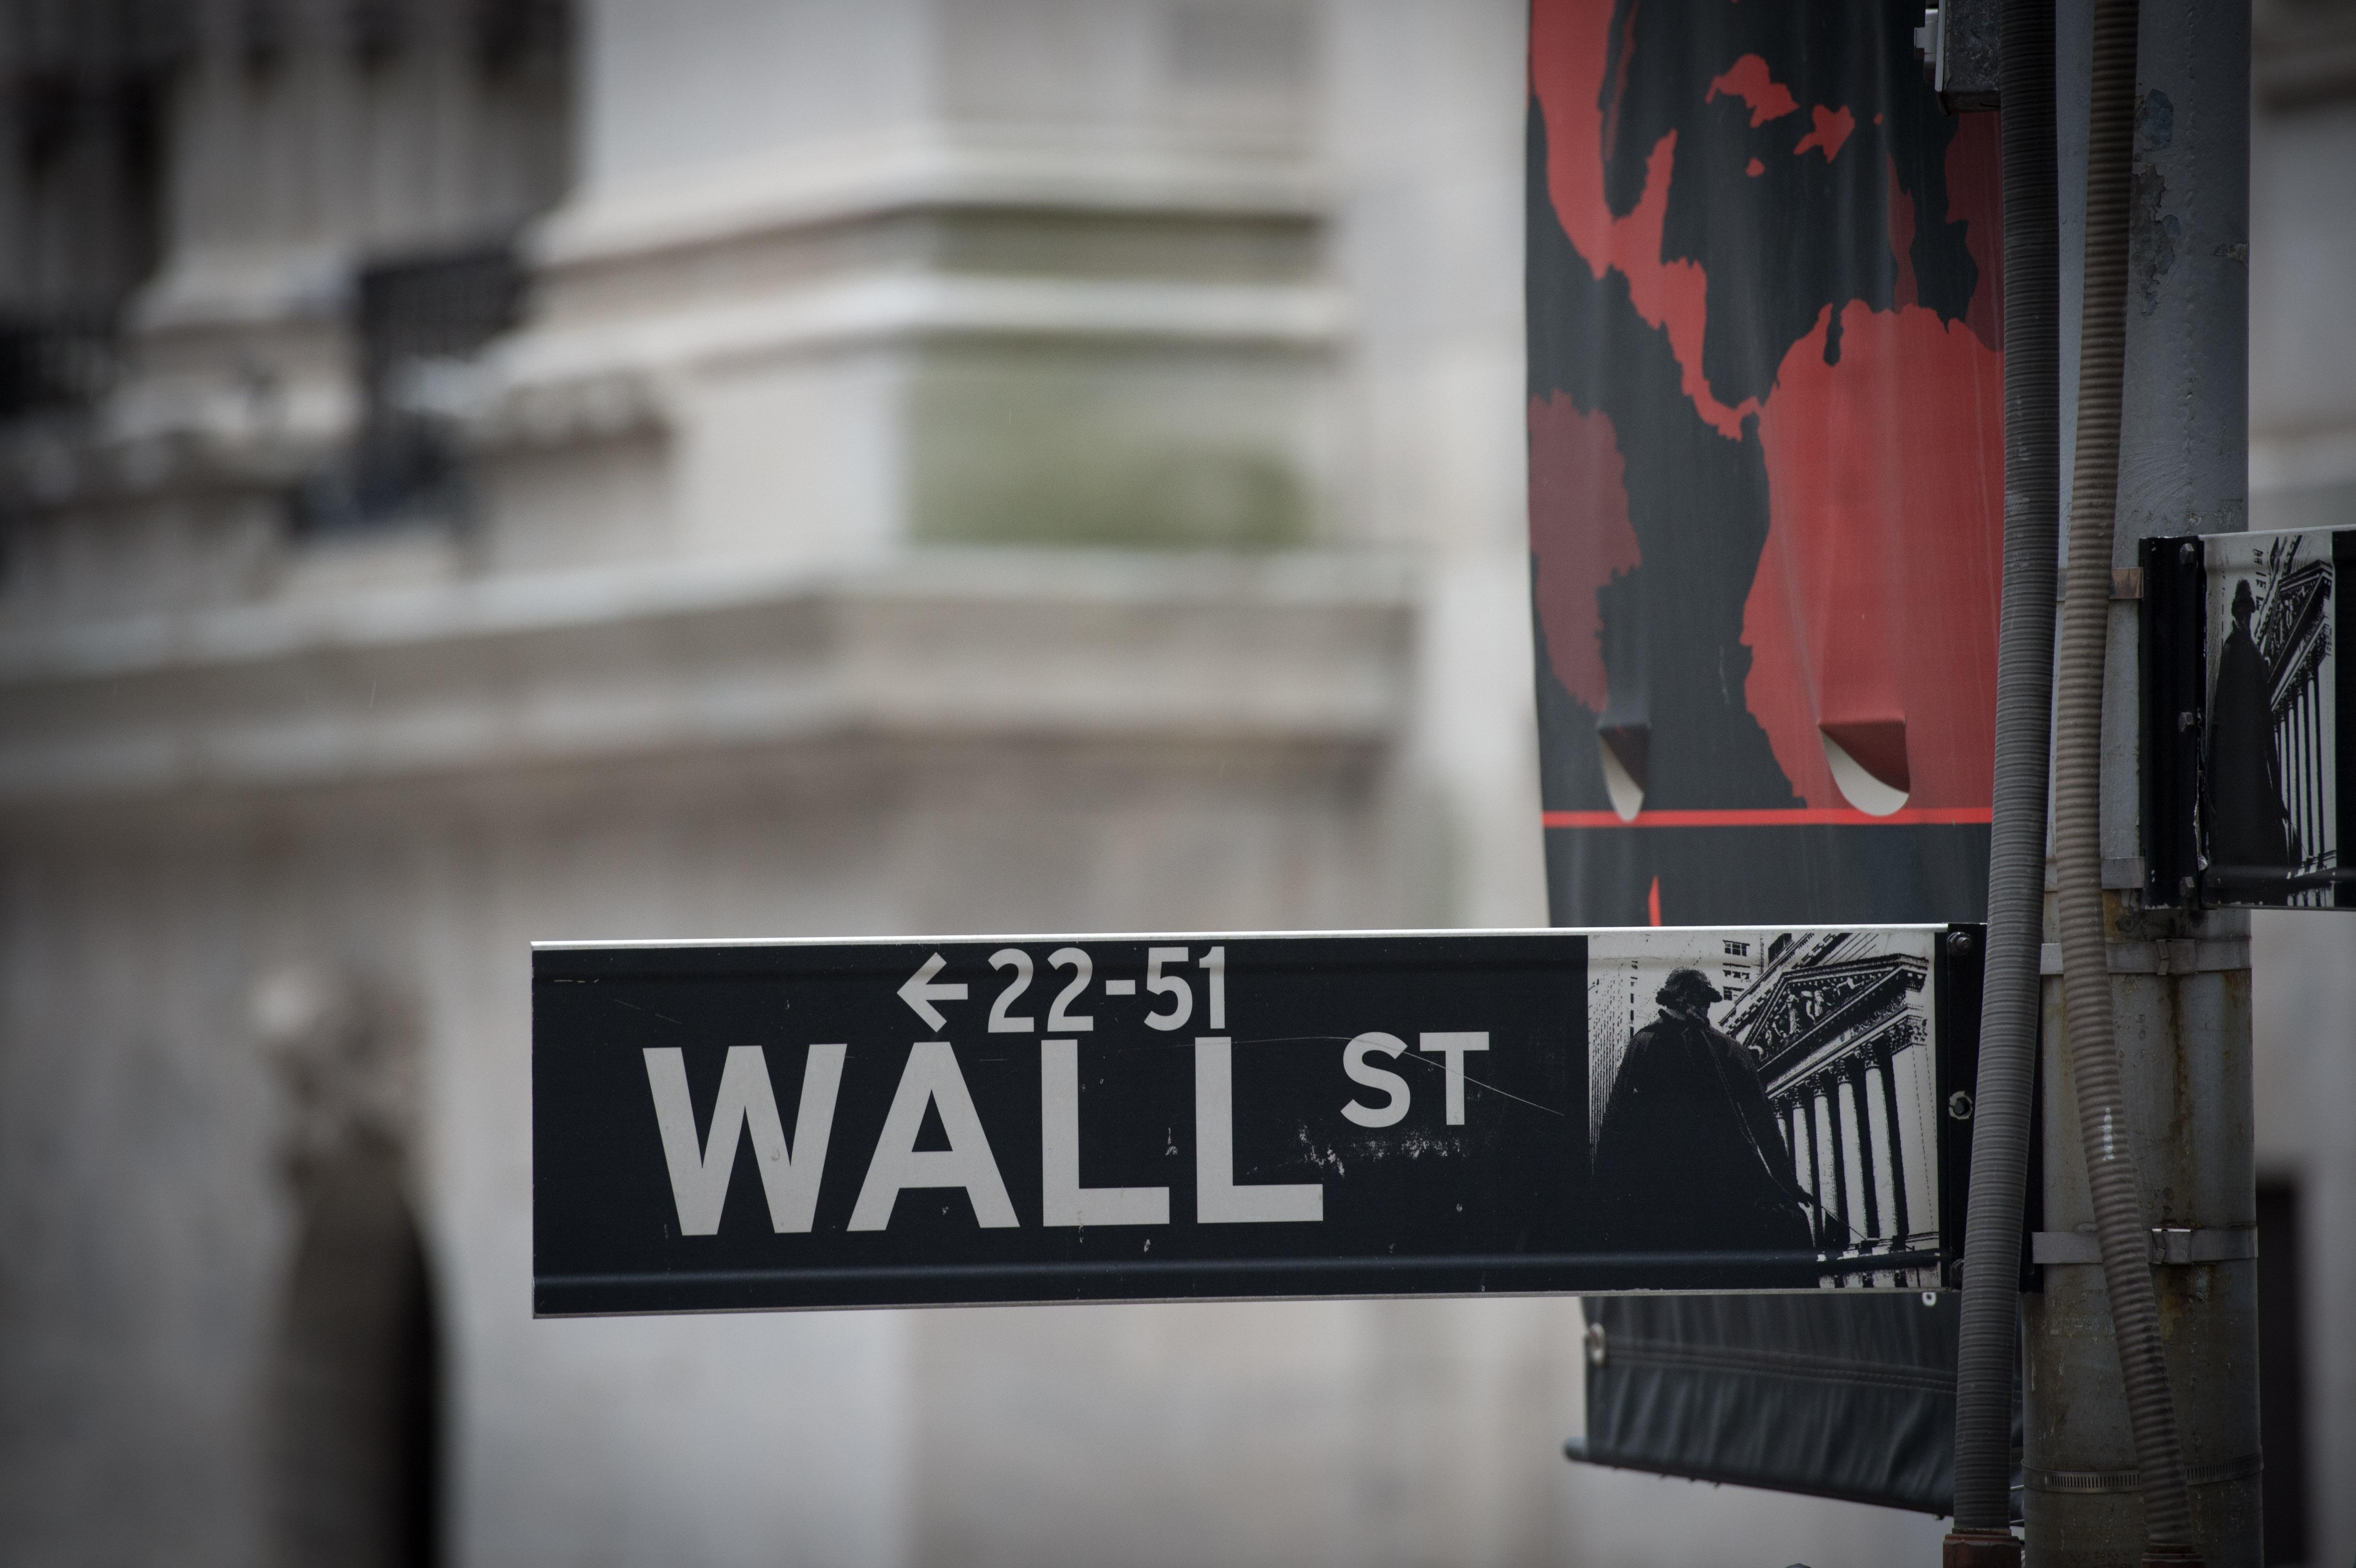 Wall street edge цены акций сбербанка